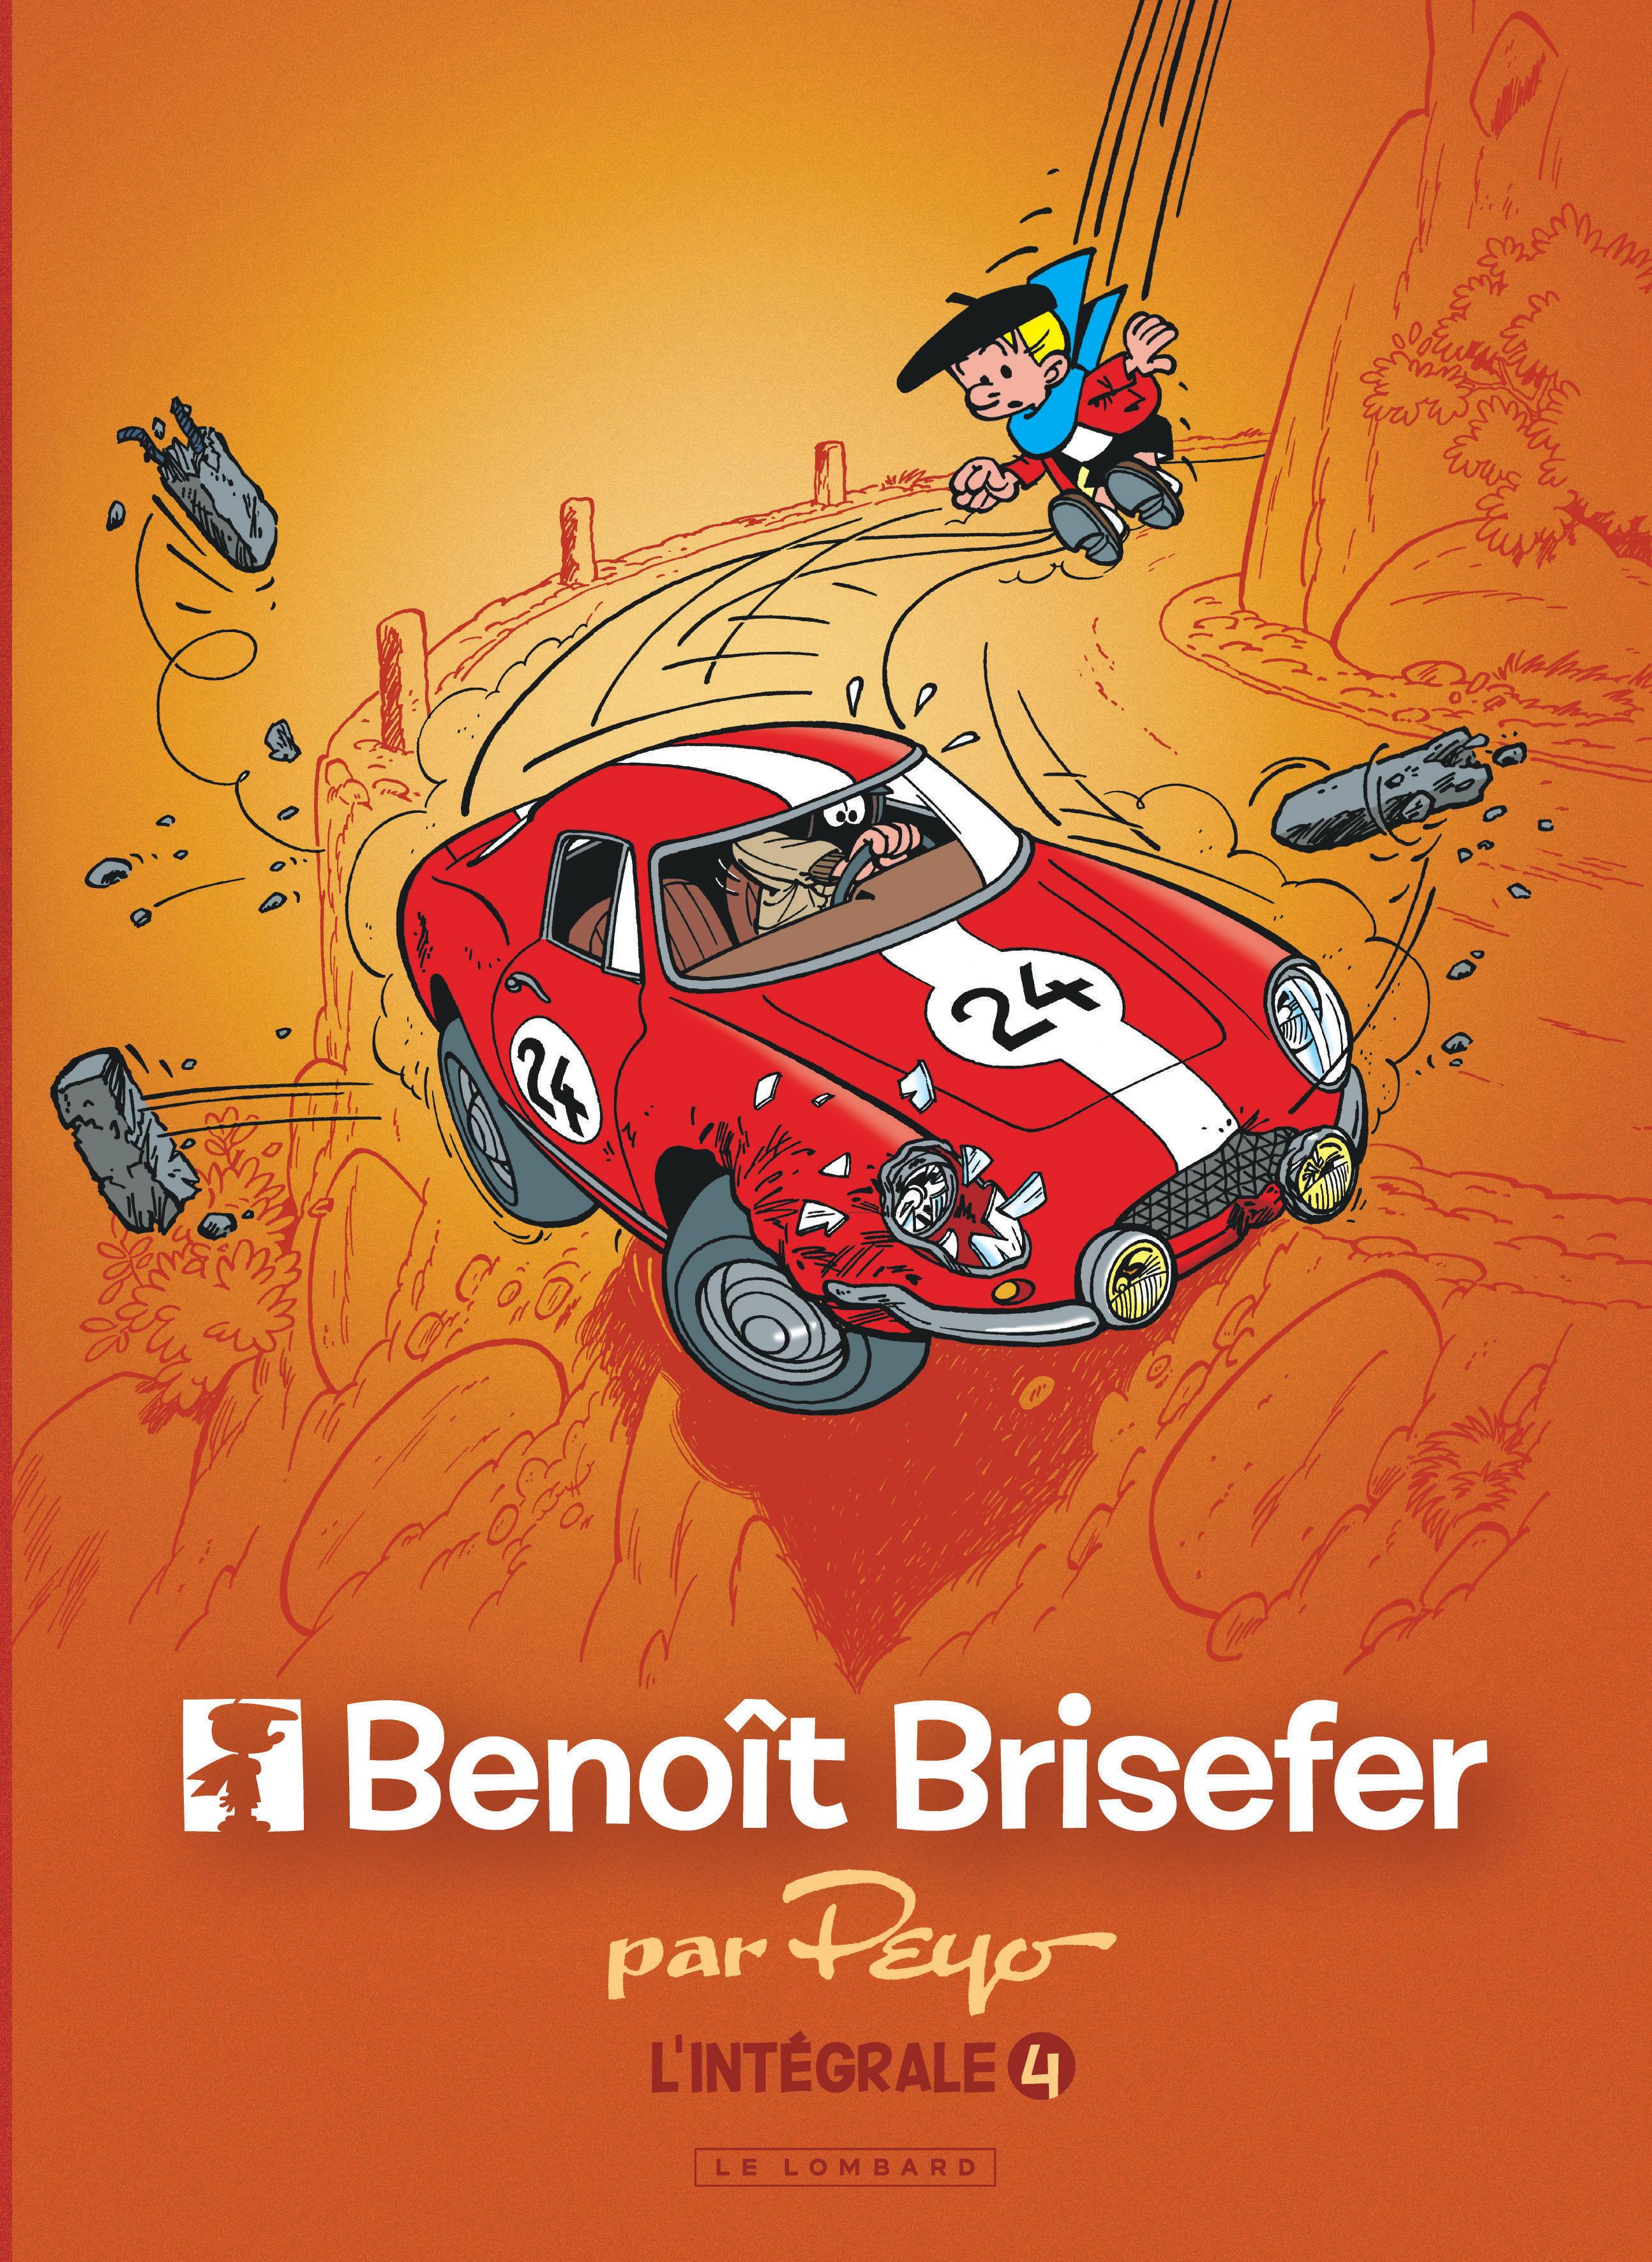 INTEGRALE BENOIT BRISEFER - TOME 4 - INTEGRALE BENOIT BRISEFER 4